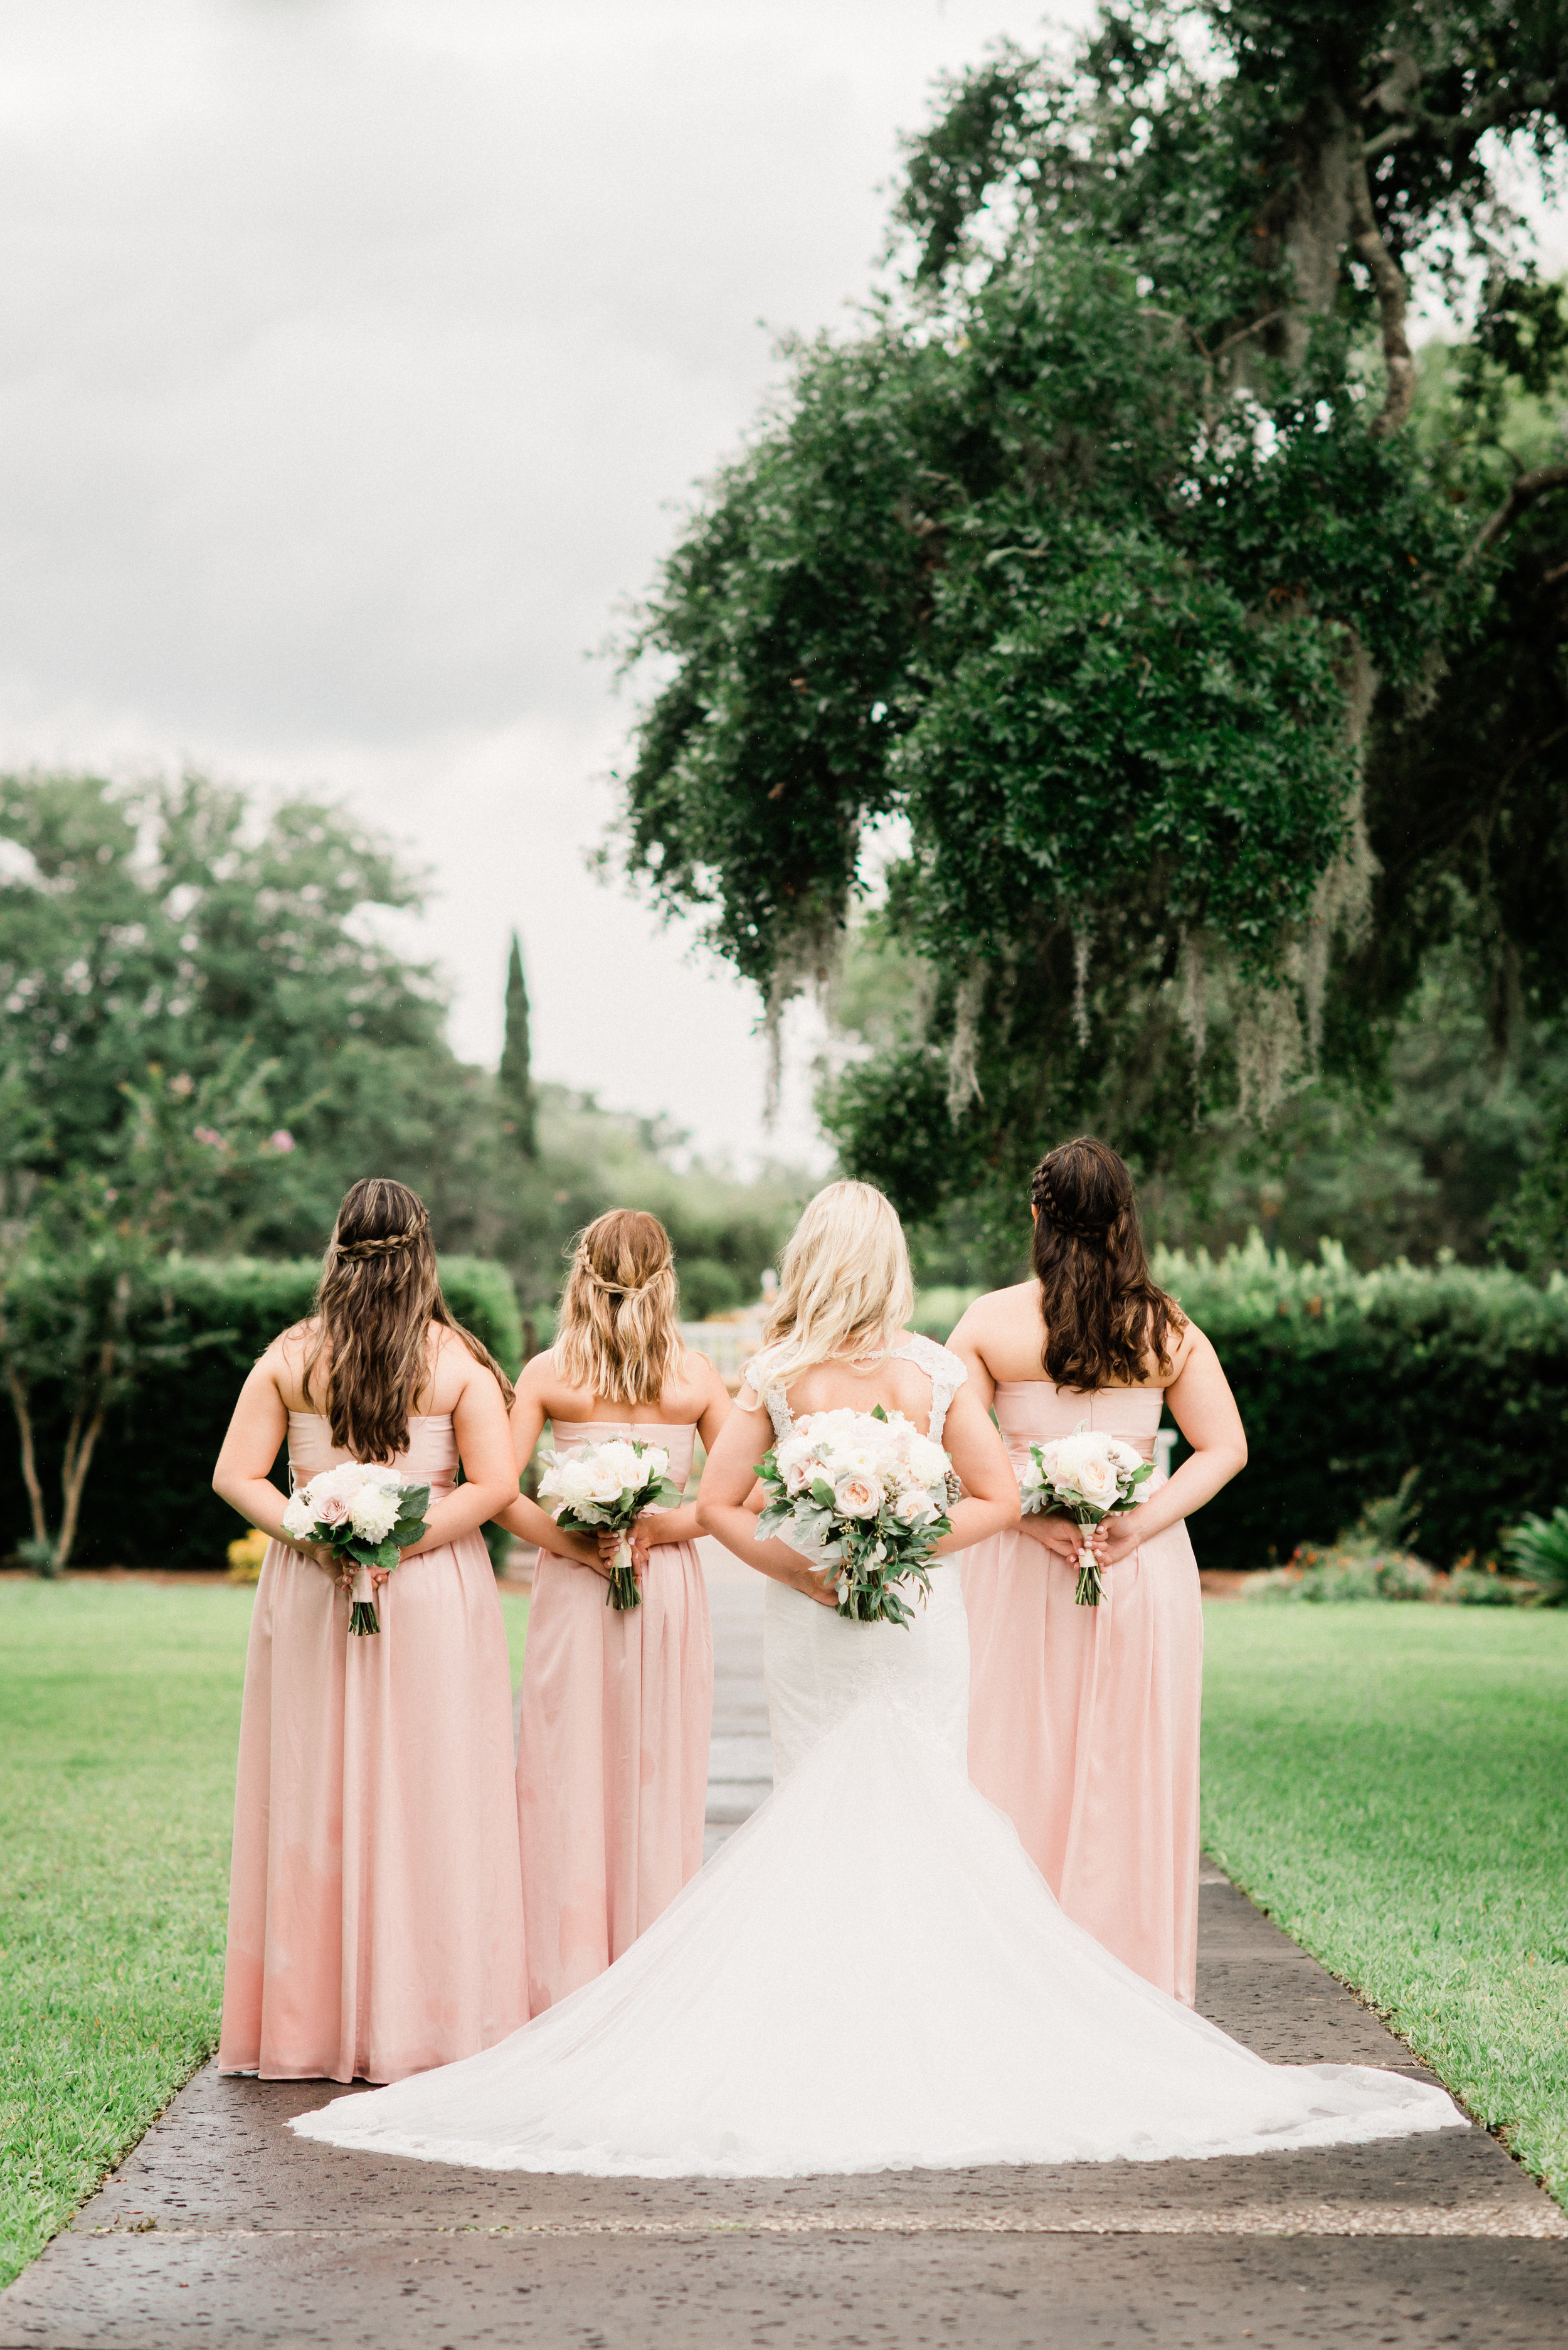 KateTaramykinStudios-Portfolio-Weddings-LeuGardens-7.jpg